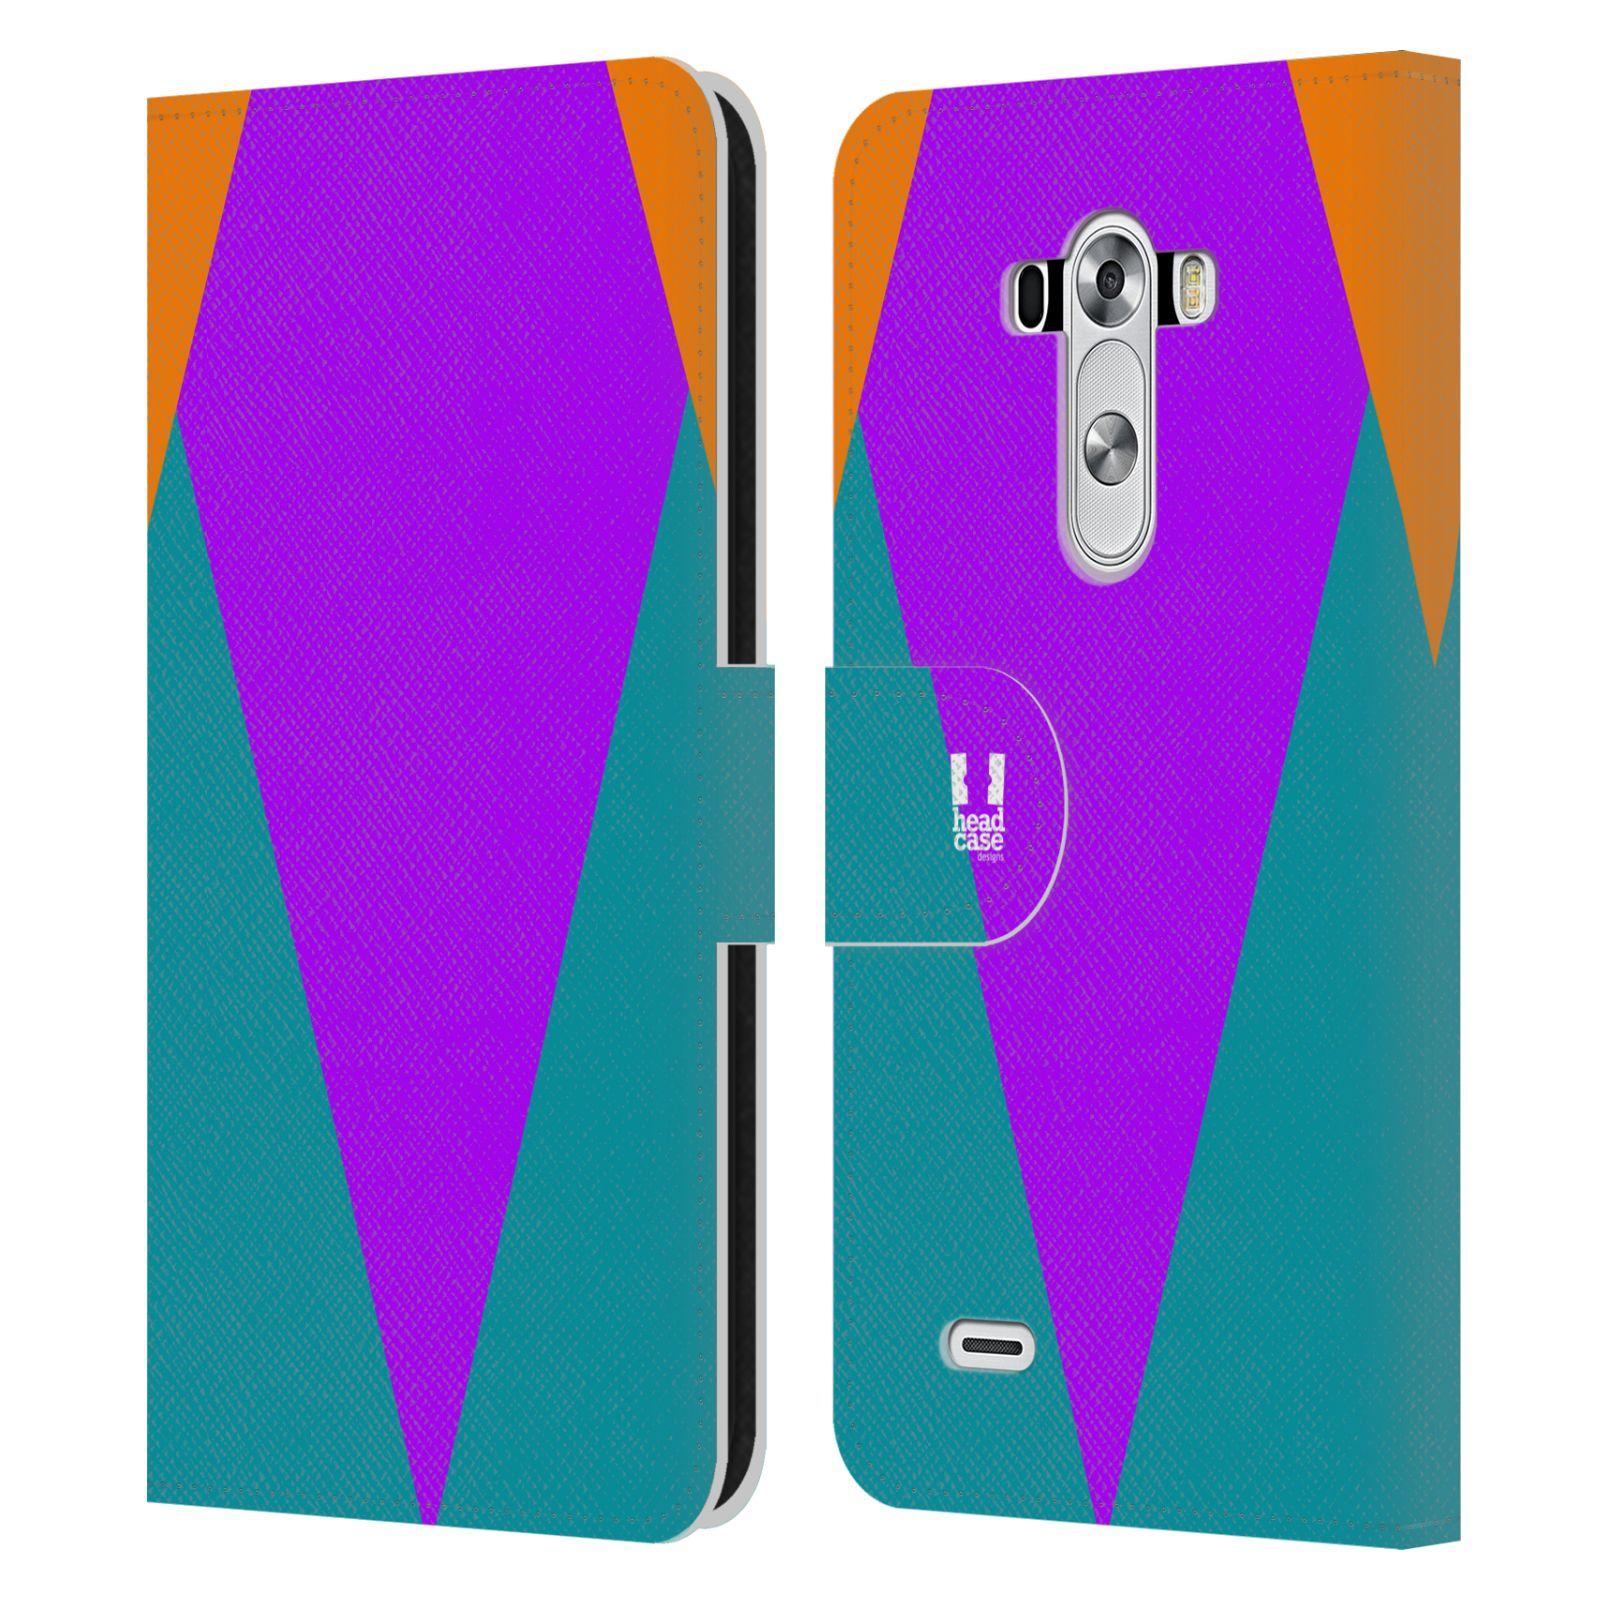 HEAD CASE Flipové pouzdro pro mobil LG G3 barevné tvary šipka fialová